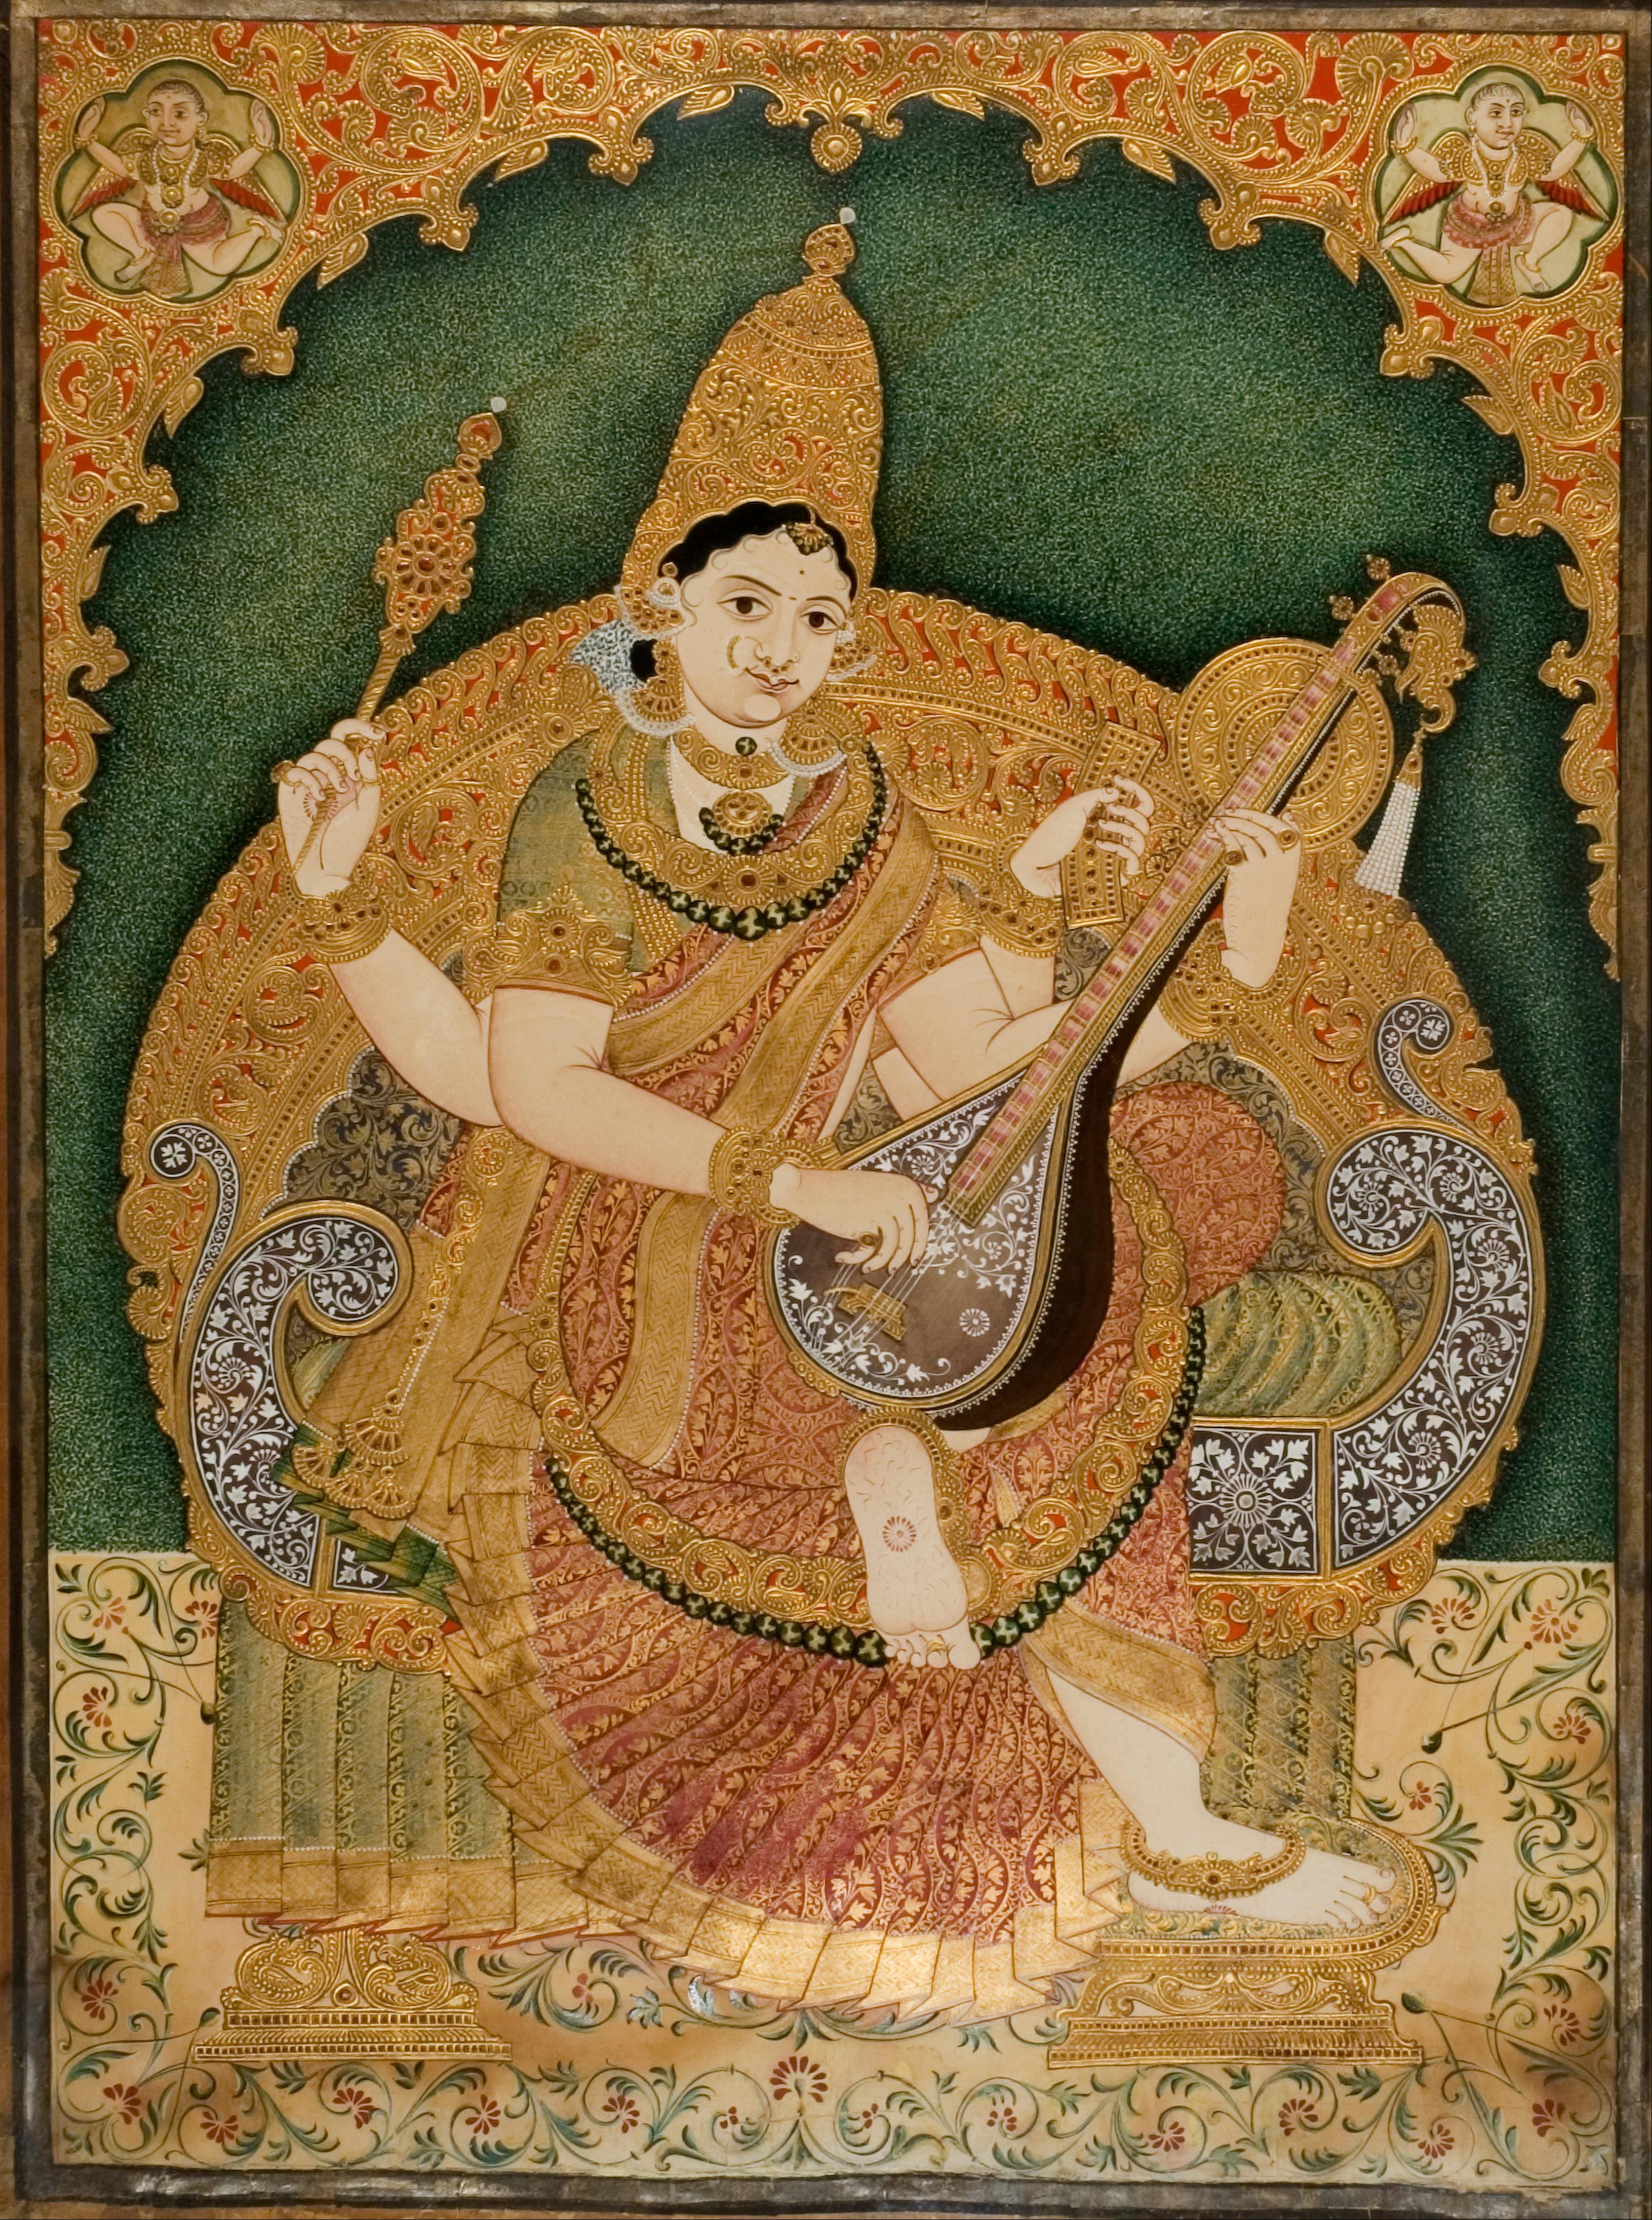 Chitragara Krishnappa, Saraswati, ca. 1800/1900, National Gallery Of Modern Art, New Delhi, India. Mojarto.